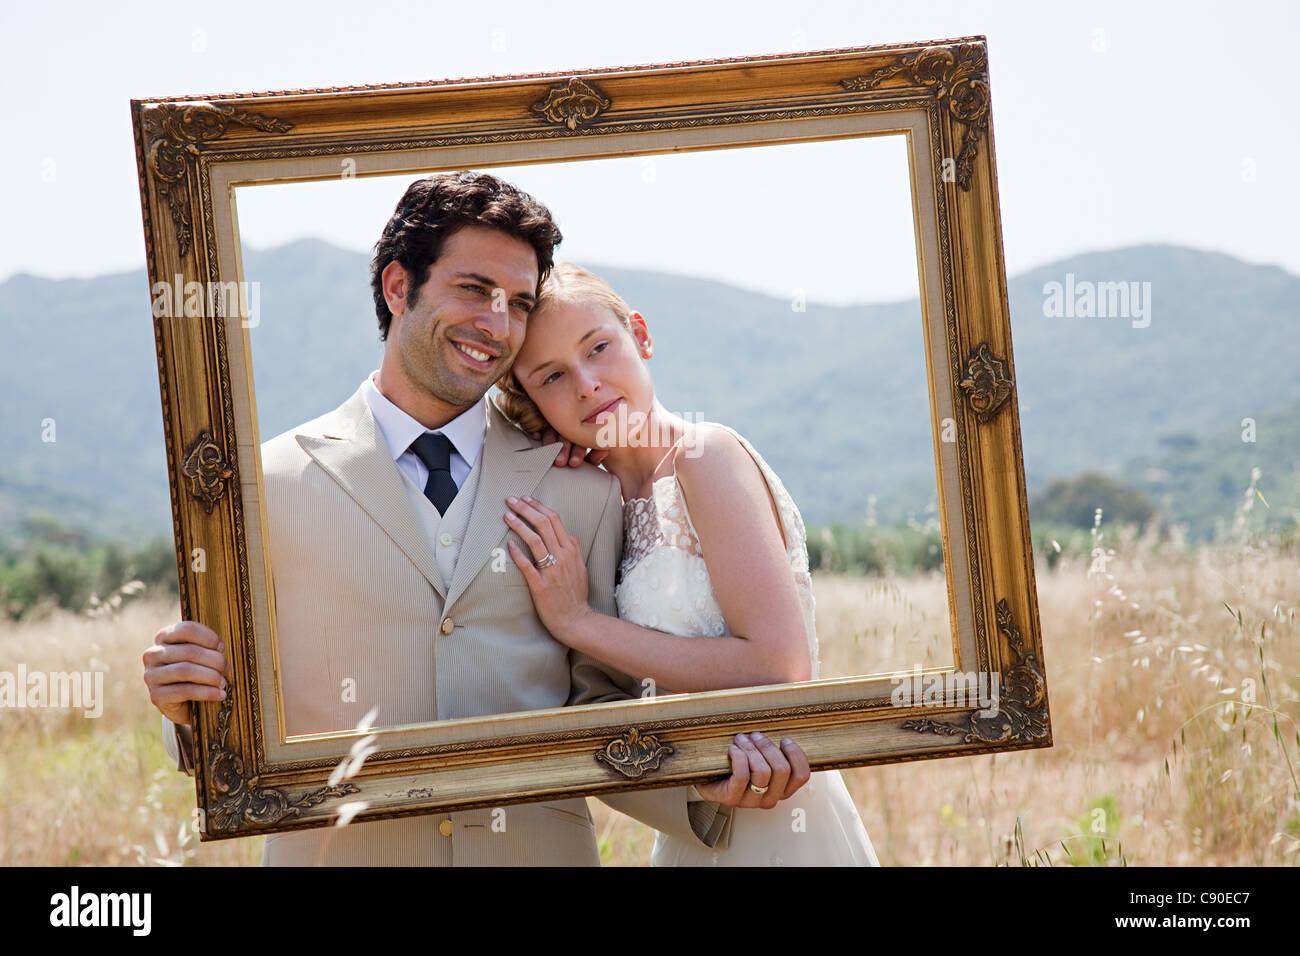 Brautpaar Mit Vintage Bilderrahmen Stockfoto Bild 39963959 Alamy